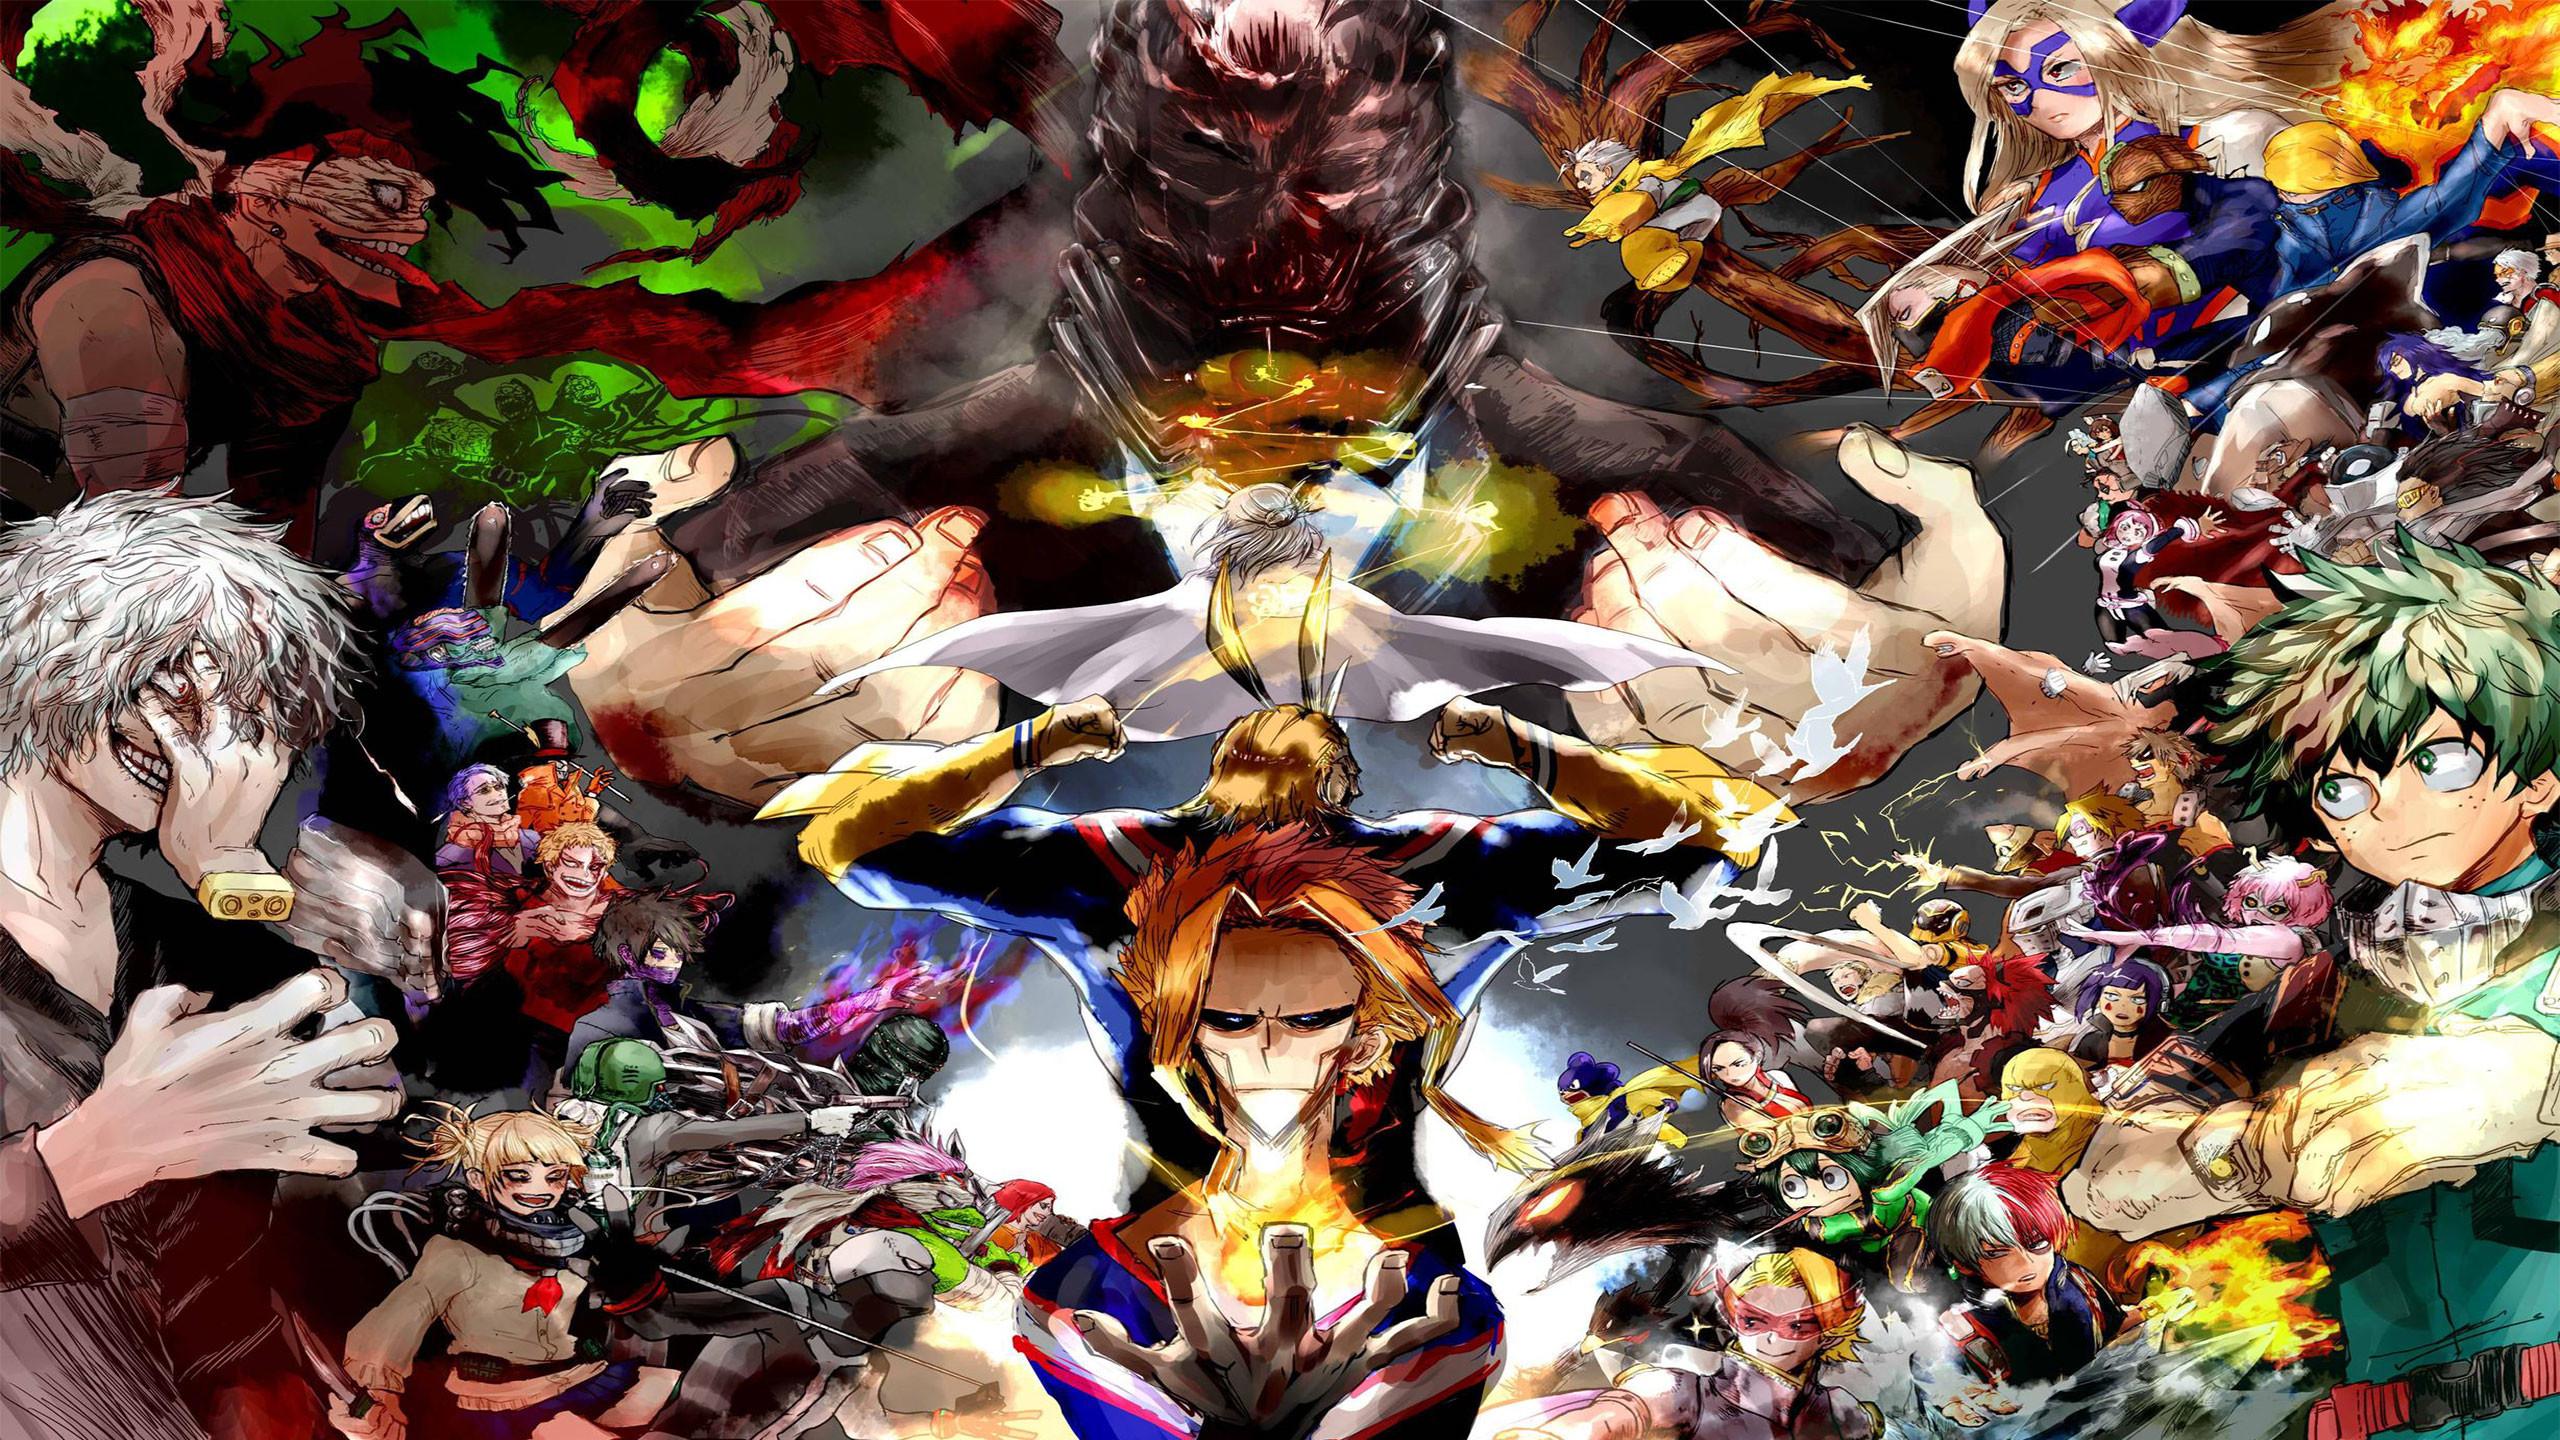 Notitle animeartamazing animeartcharacterdesign animeartgalaxy animeartmanga japananimeart my hero academia episodes my hero hero wallpaper. My Hero Academia Wallpapers ·① WallpaperTag